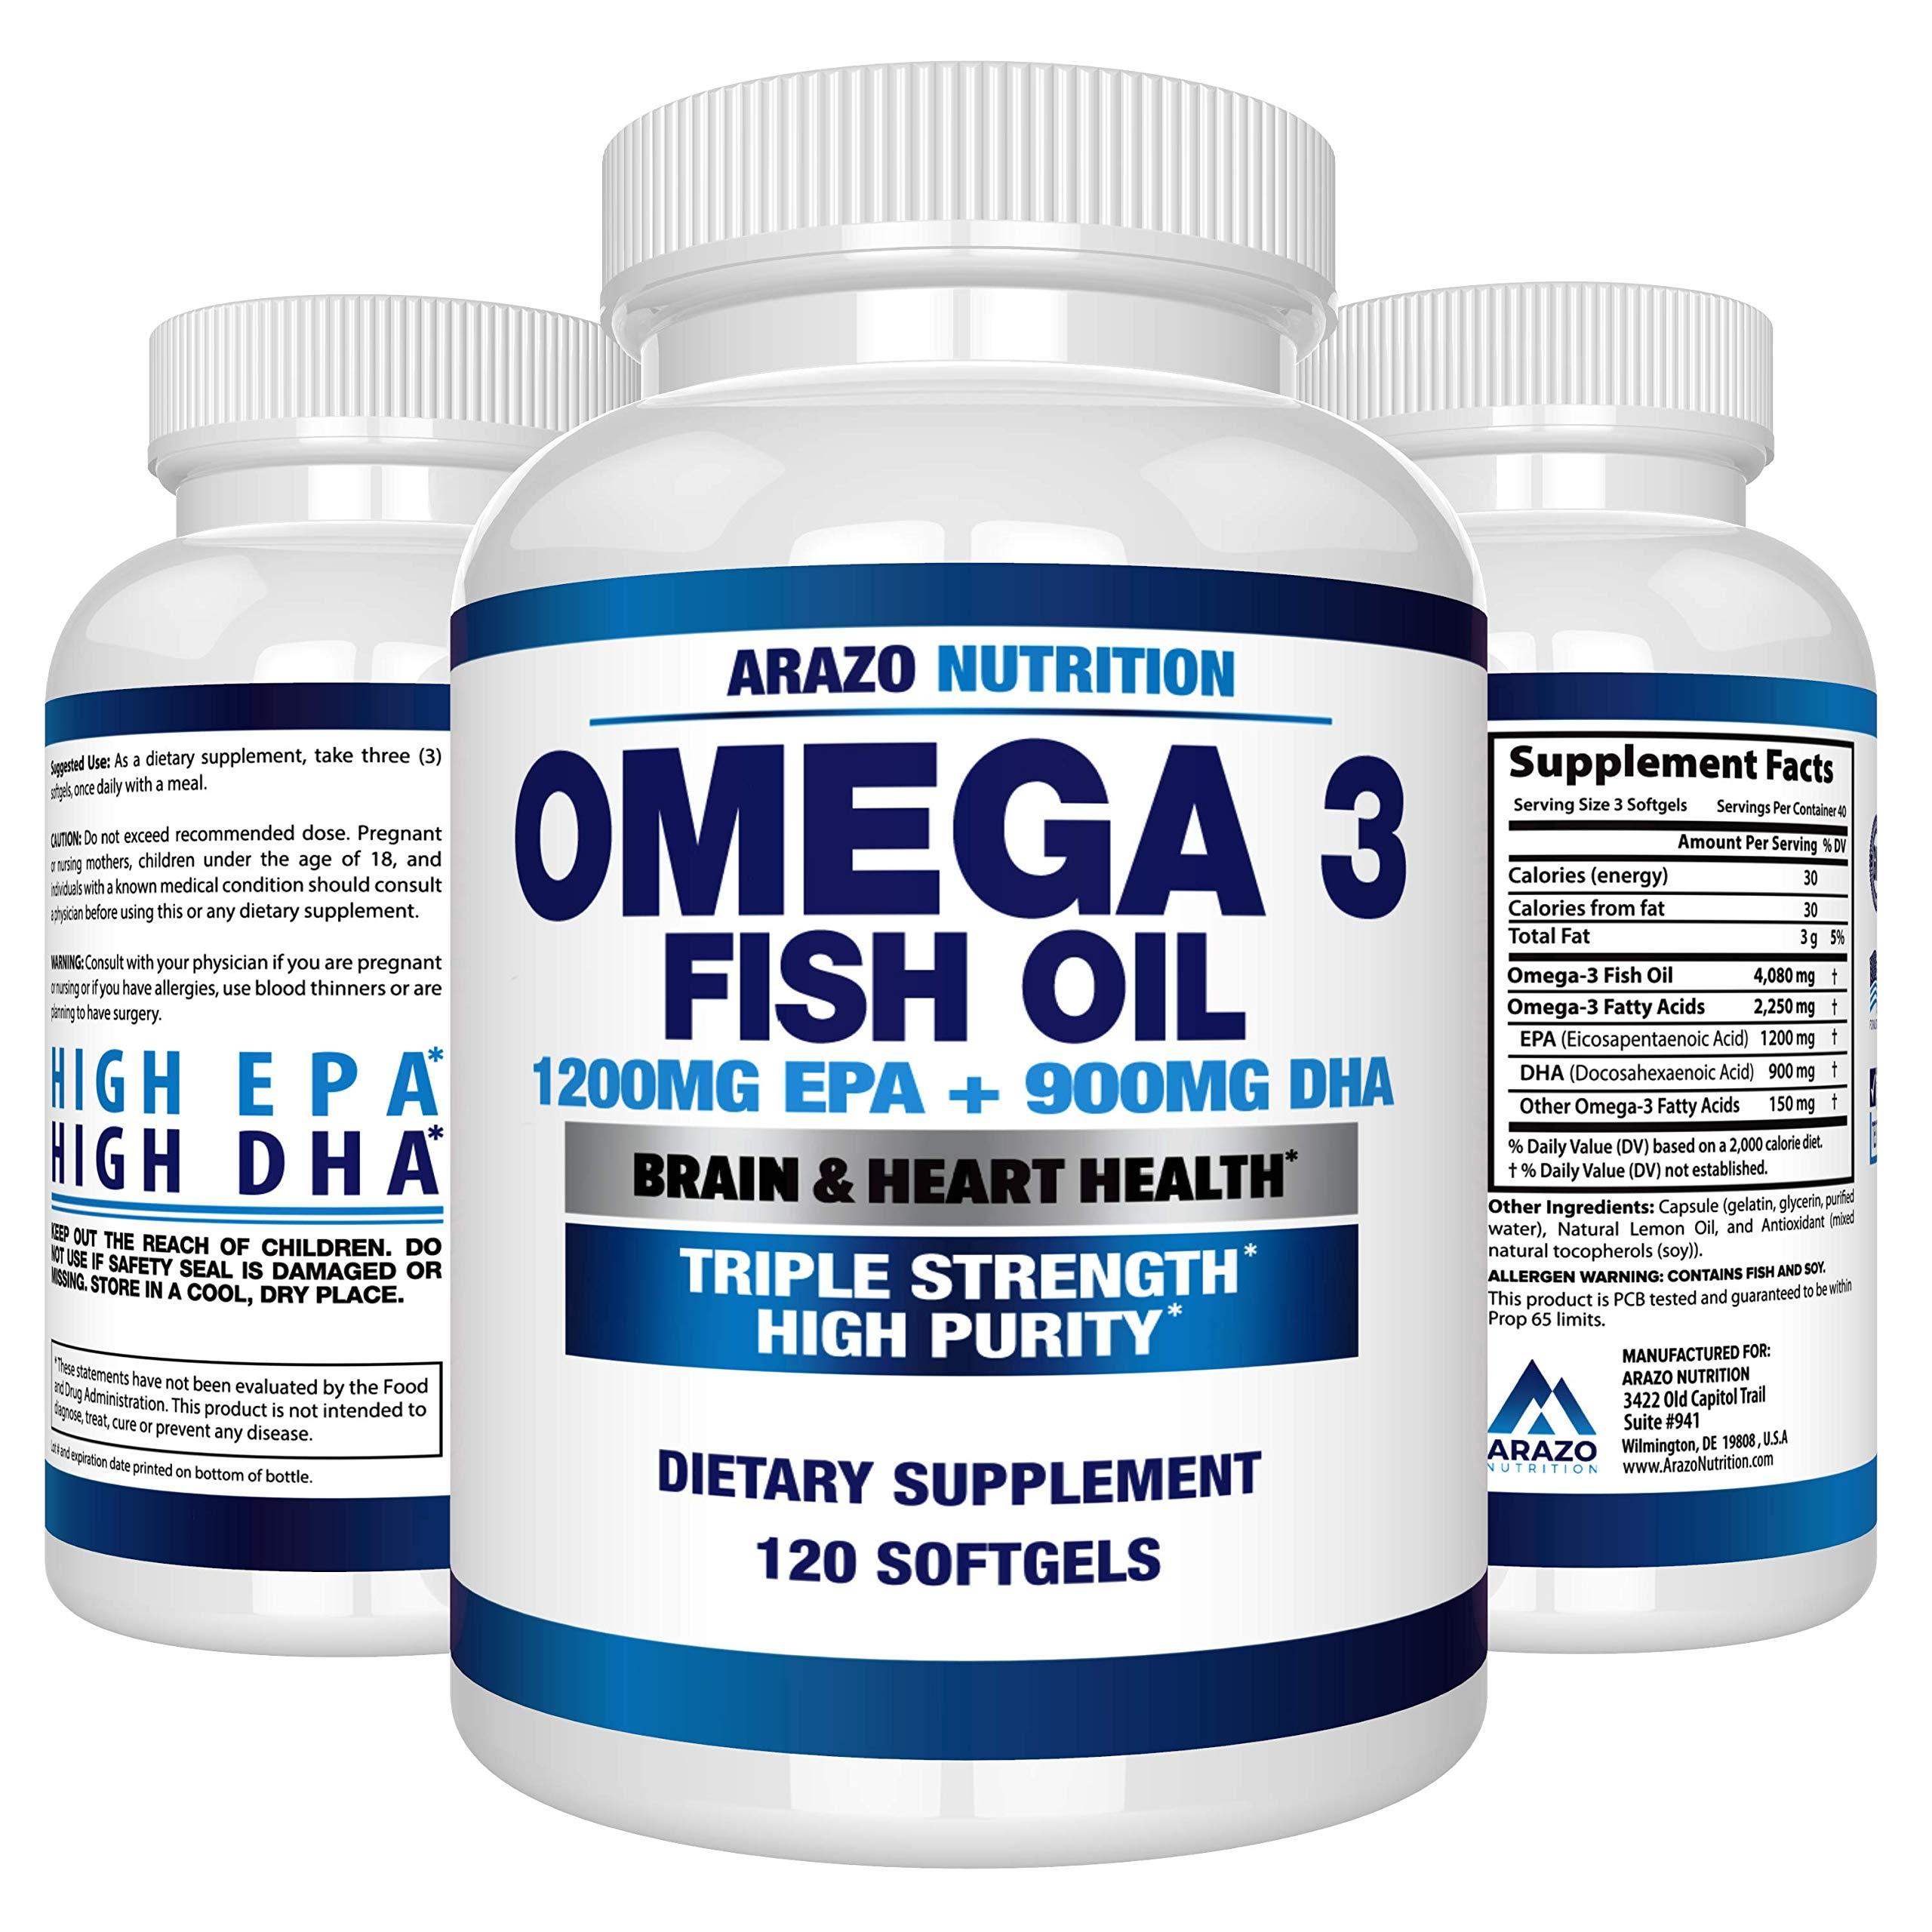 Omega 3 Fish Oil 2250mg - High EPA 1200MG + DHA 900MG Triple Strength Burpless Capsules - Arazo Nutrition (120 Count) by Arazo Nutrition